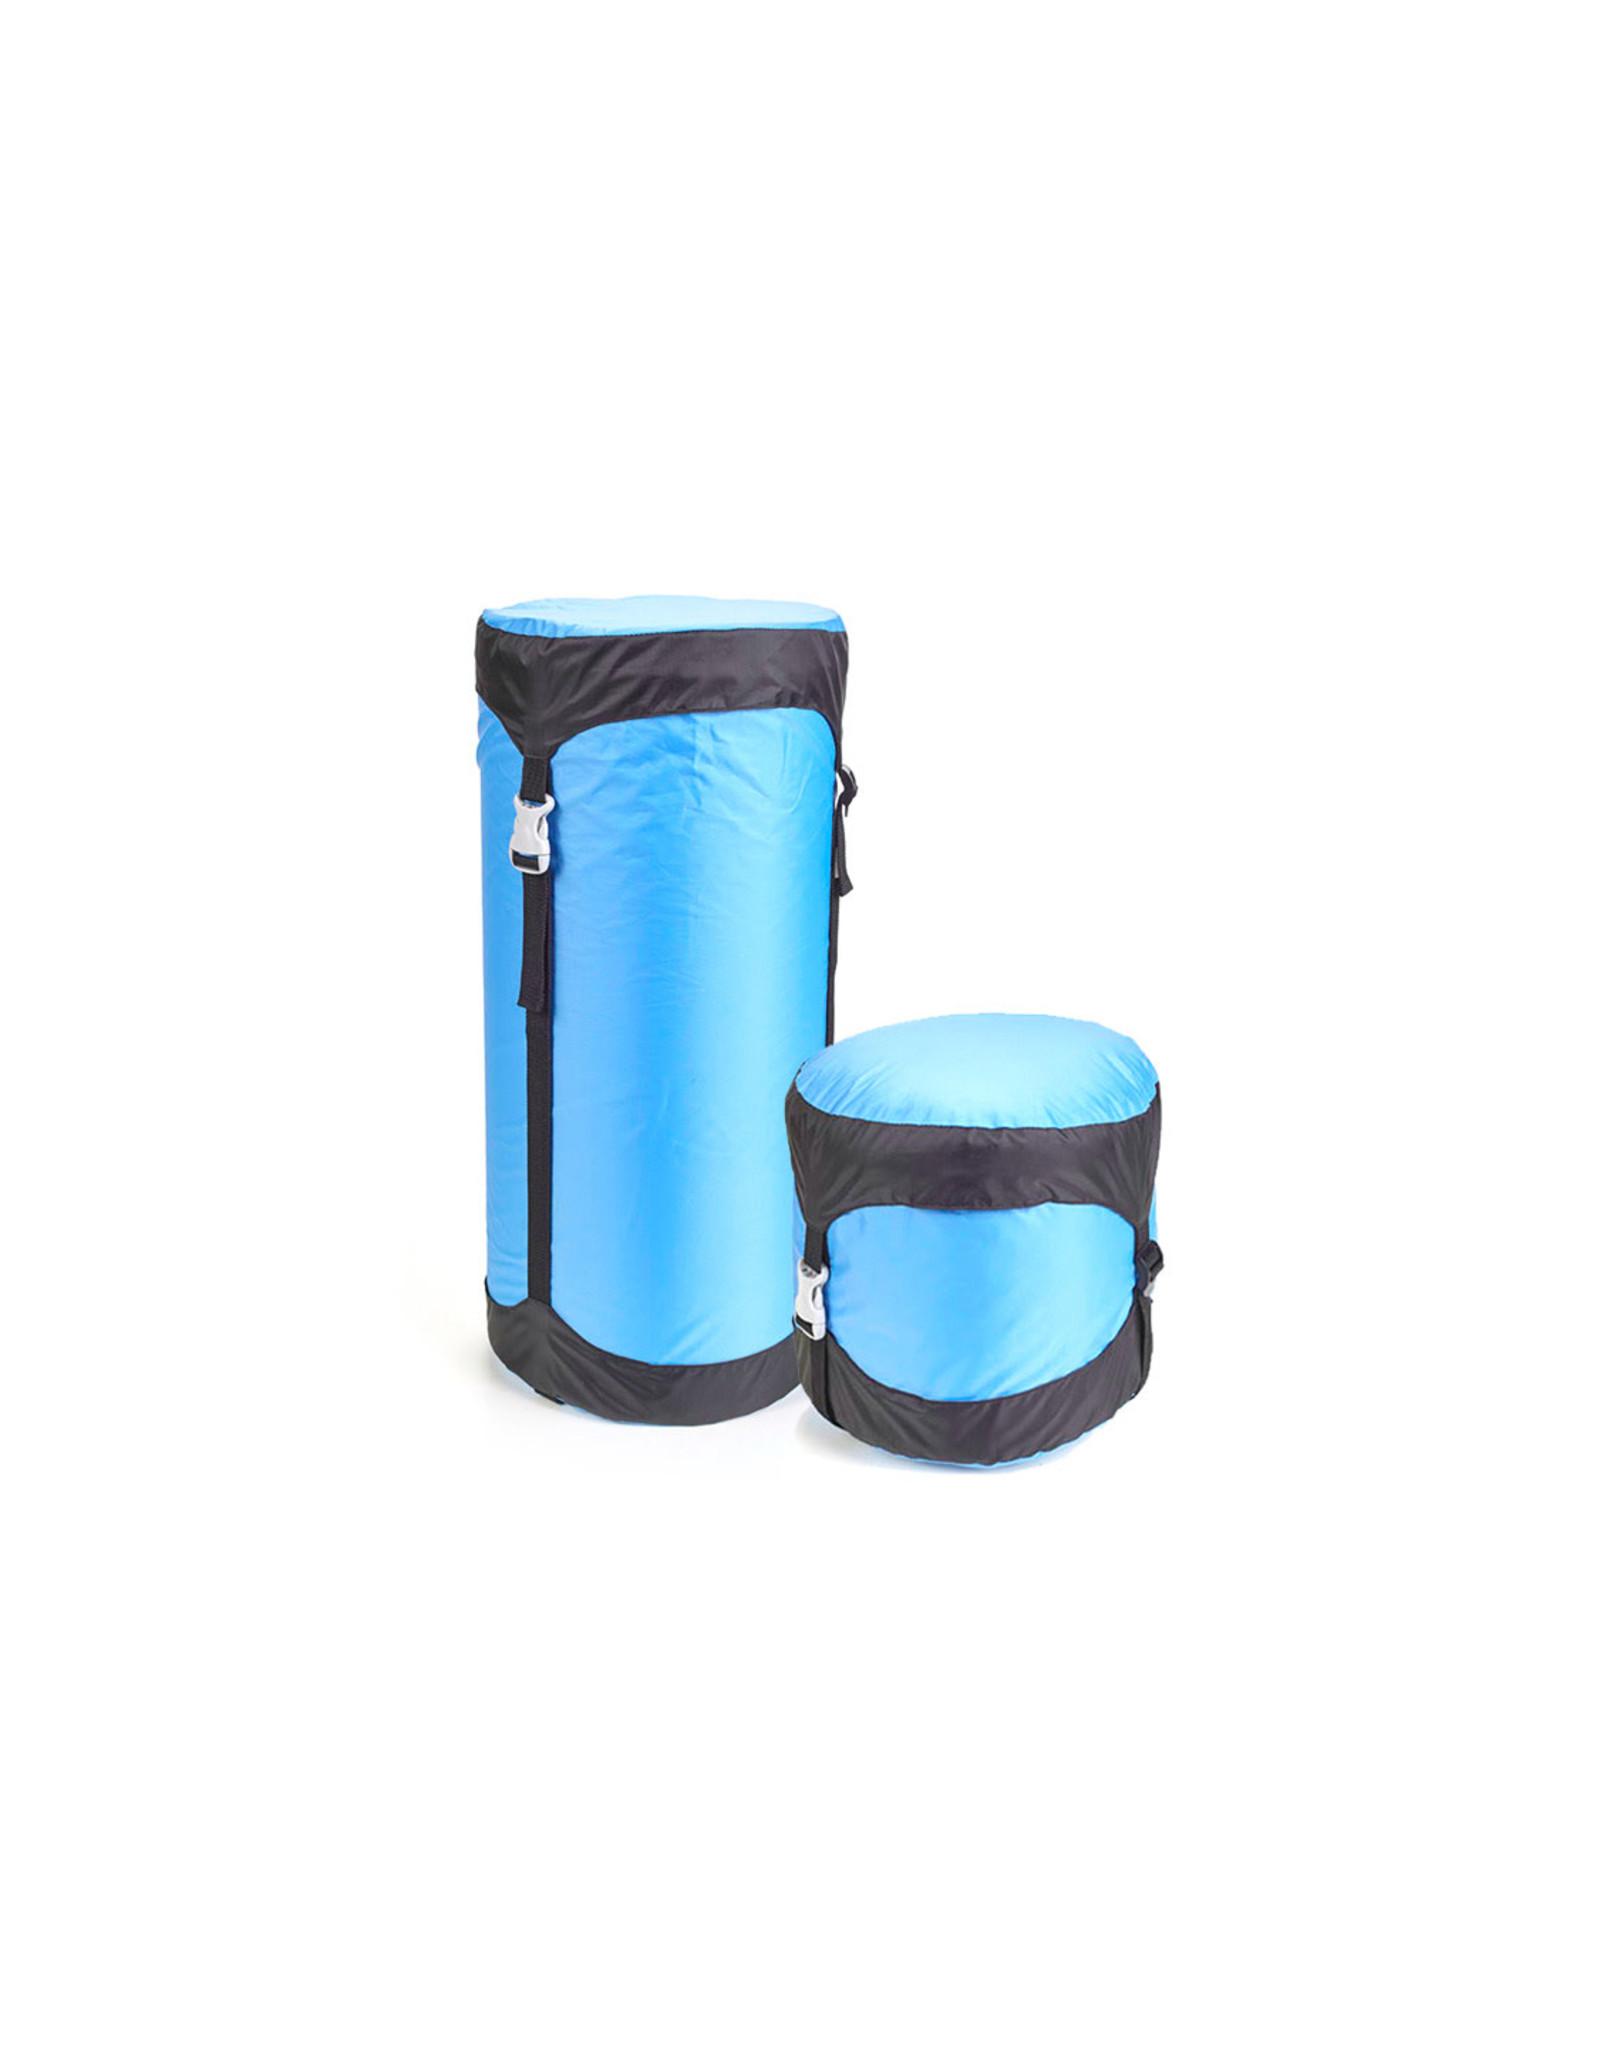 Hotcore Outdoor Products Hotcore BOA Compression Bag 20L